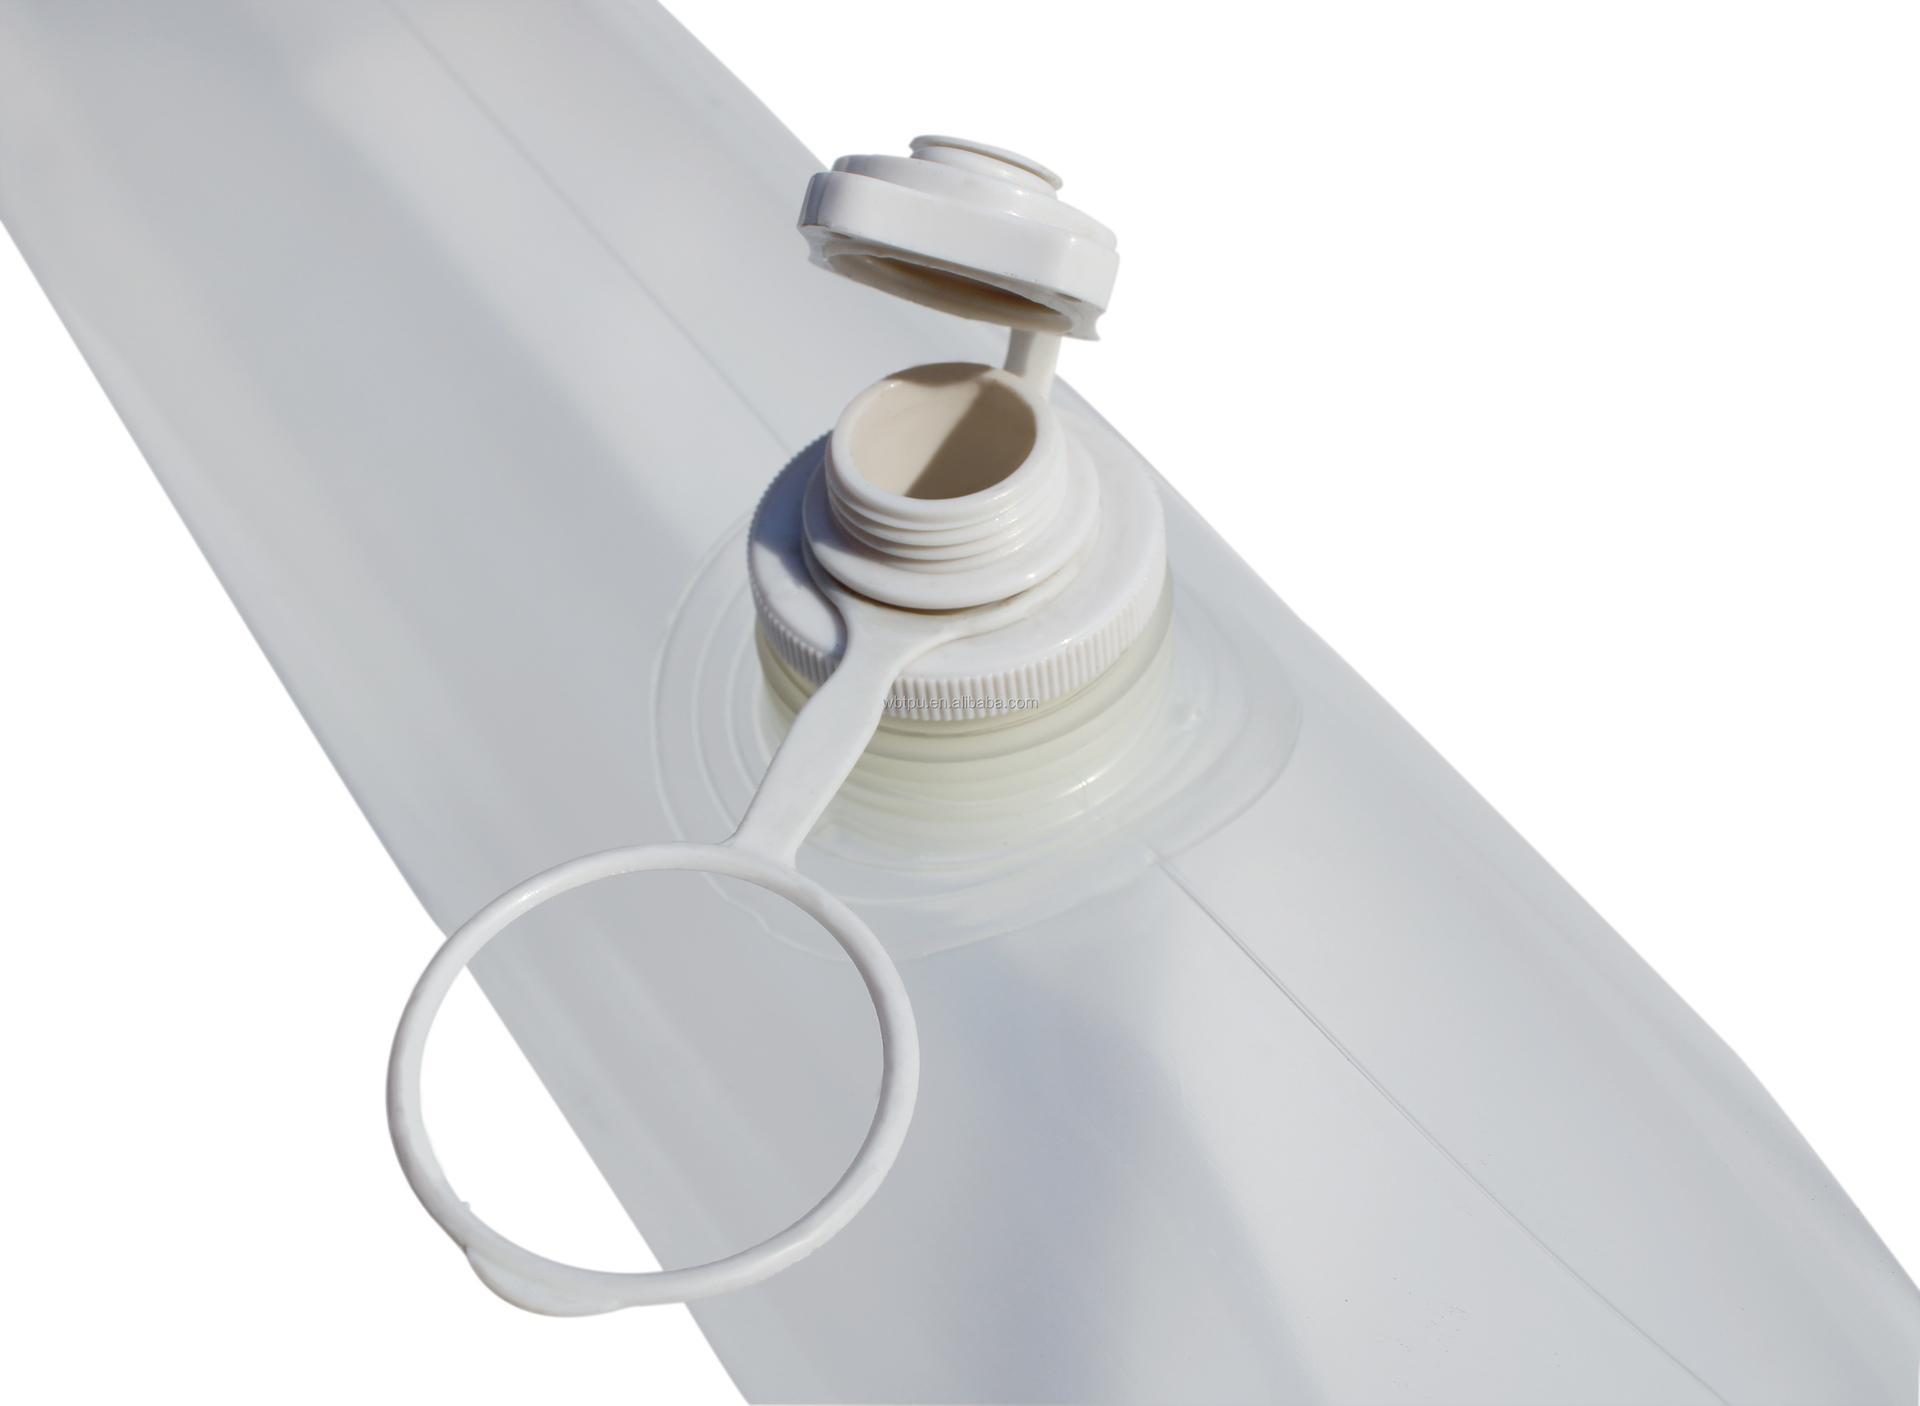 WANBAN TPU inflatable tube,airbag, tent pillar